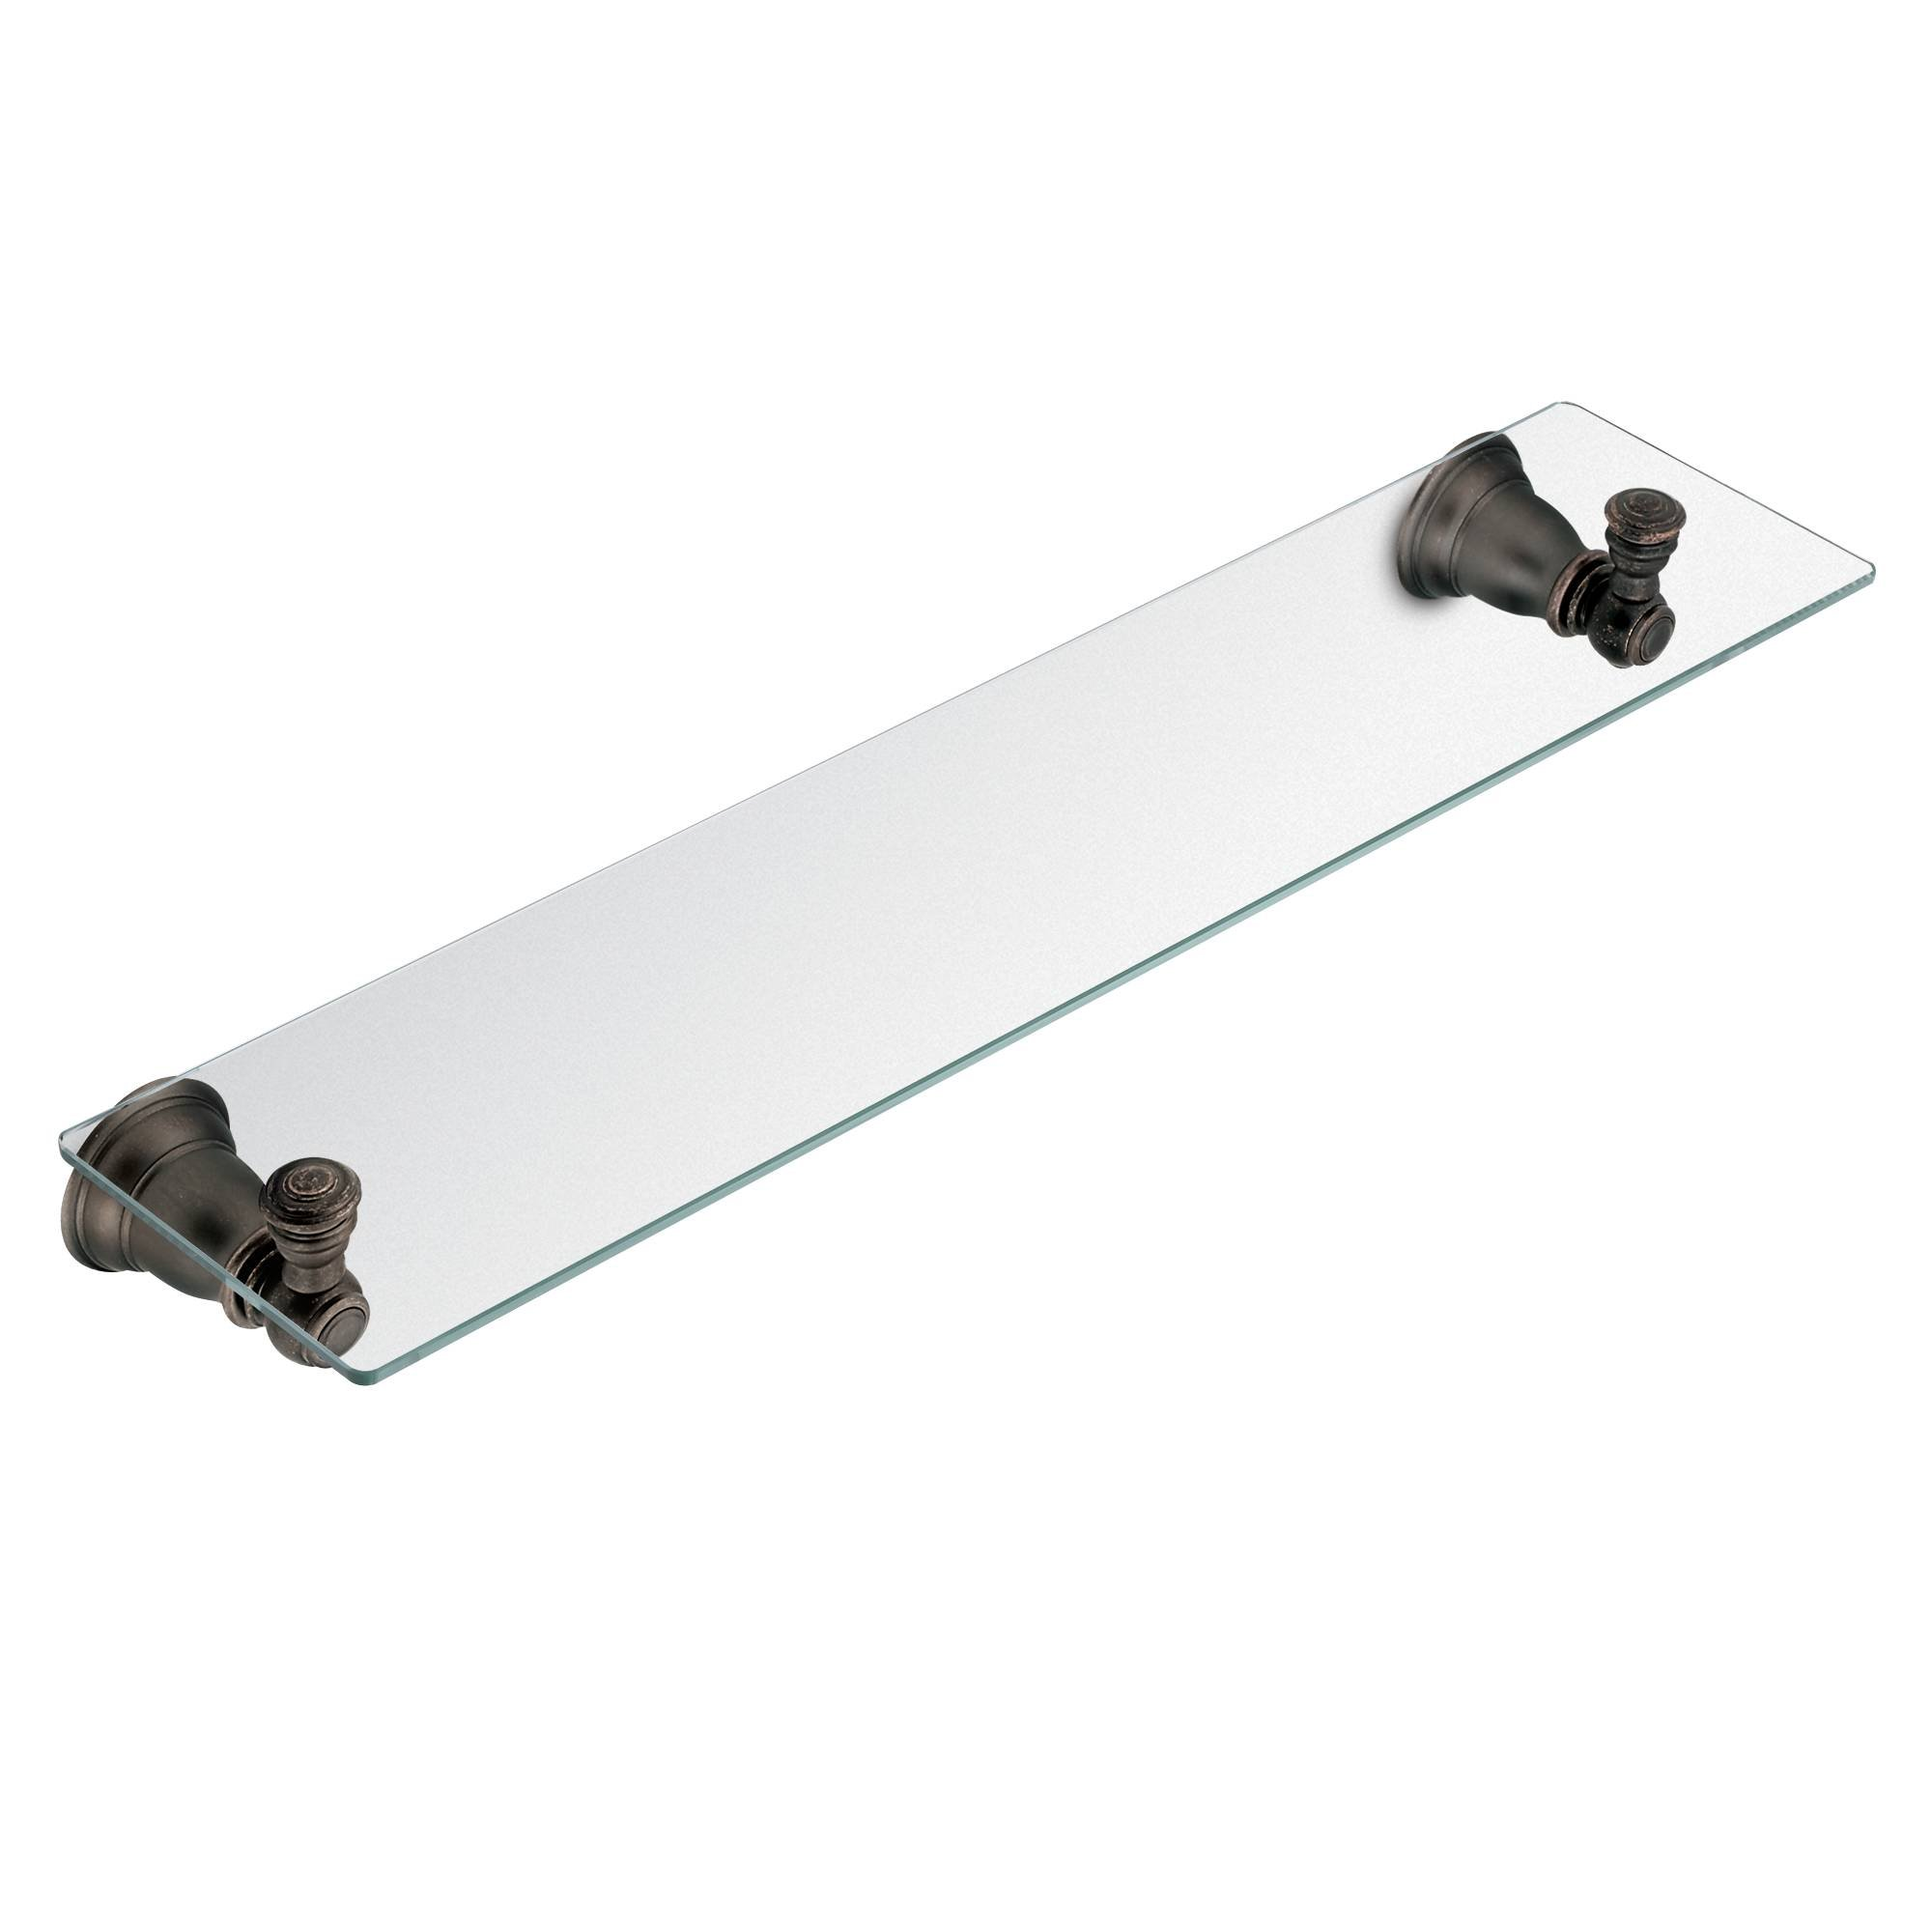 Moen YB5490ORB Kingsley 20-Inch W x 5-Inch D Decorative Bathroom Vanity Glass Shelf,, Oil Rubbed Bronze by Moen